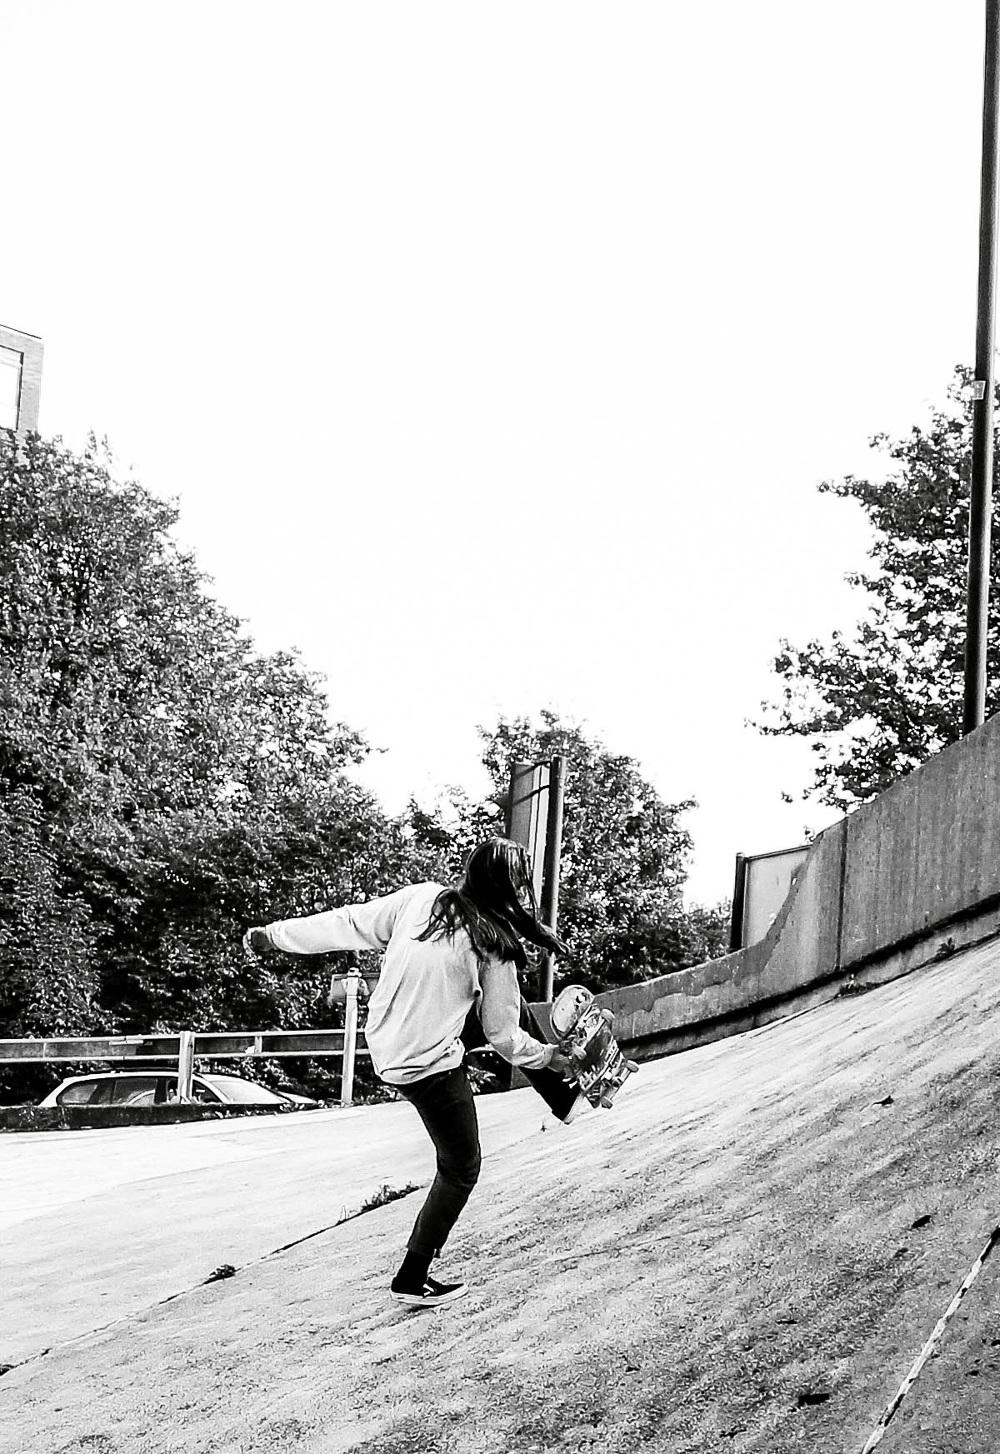 Girl skateboarding photography